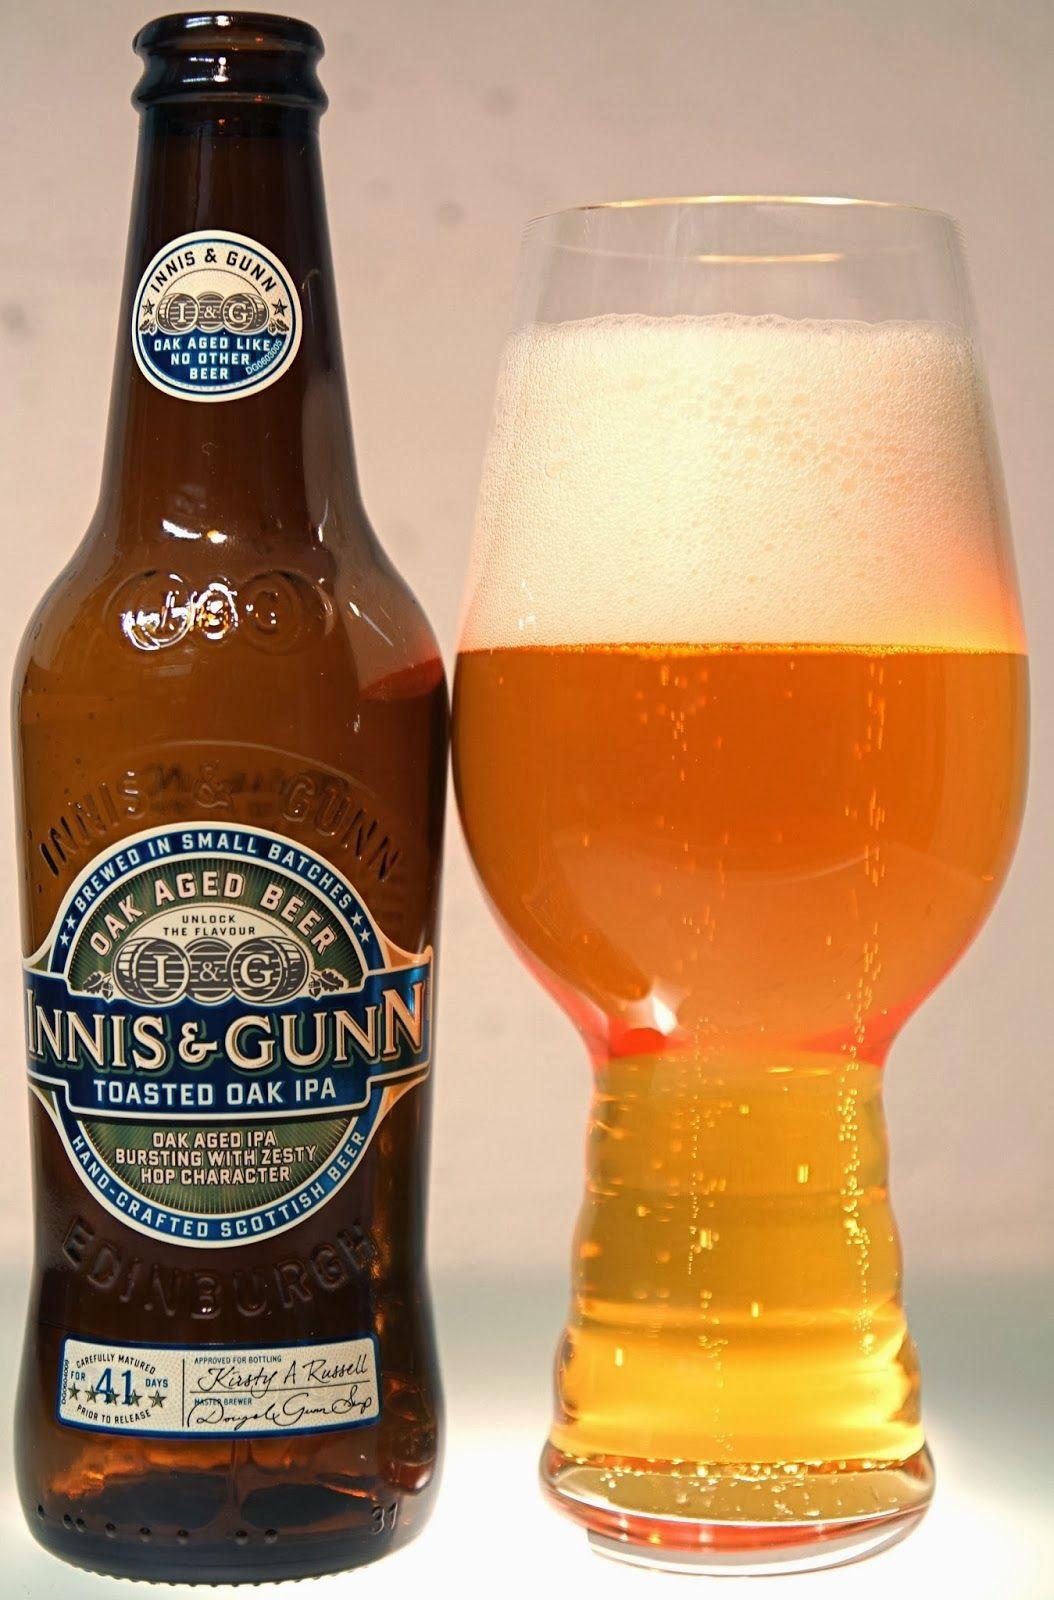 Innis and Gunn Brewery - Innis & Gunn Toasted Oak IPA oak aged 5,6% pullo